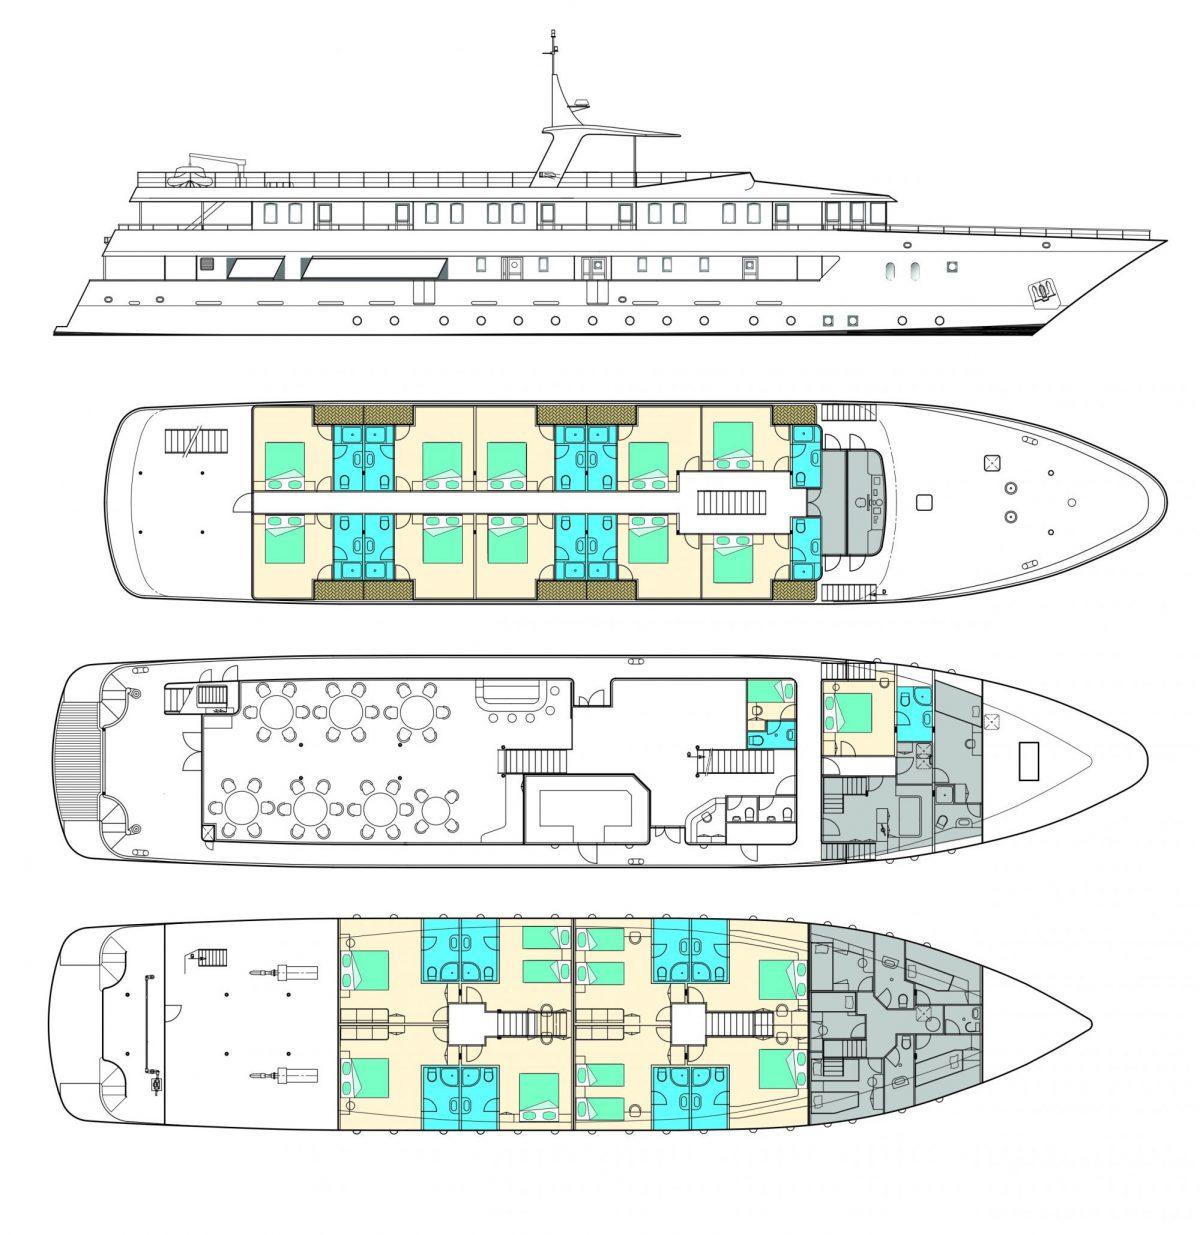 Adriatic Sun Deck Plan